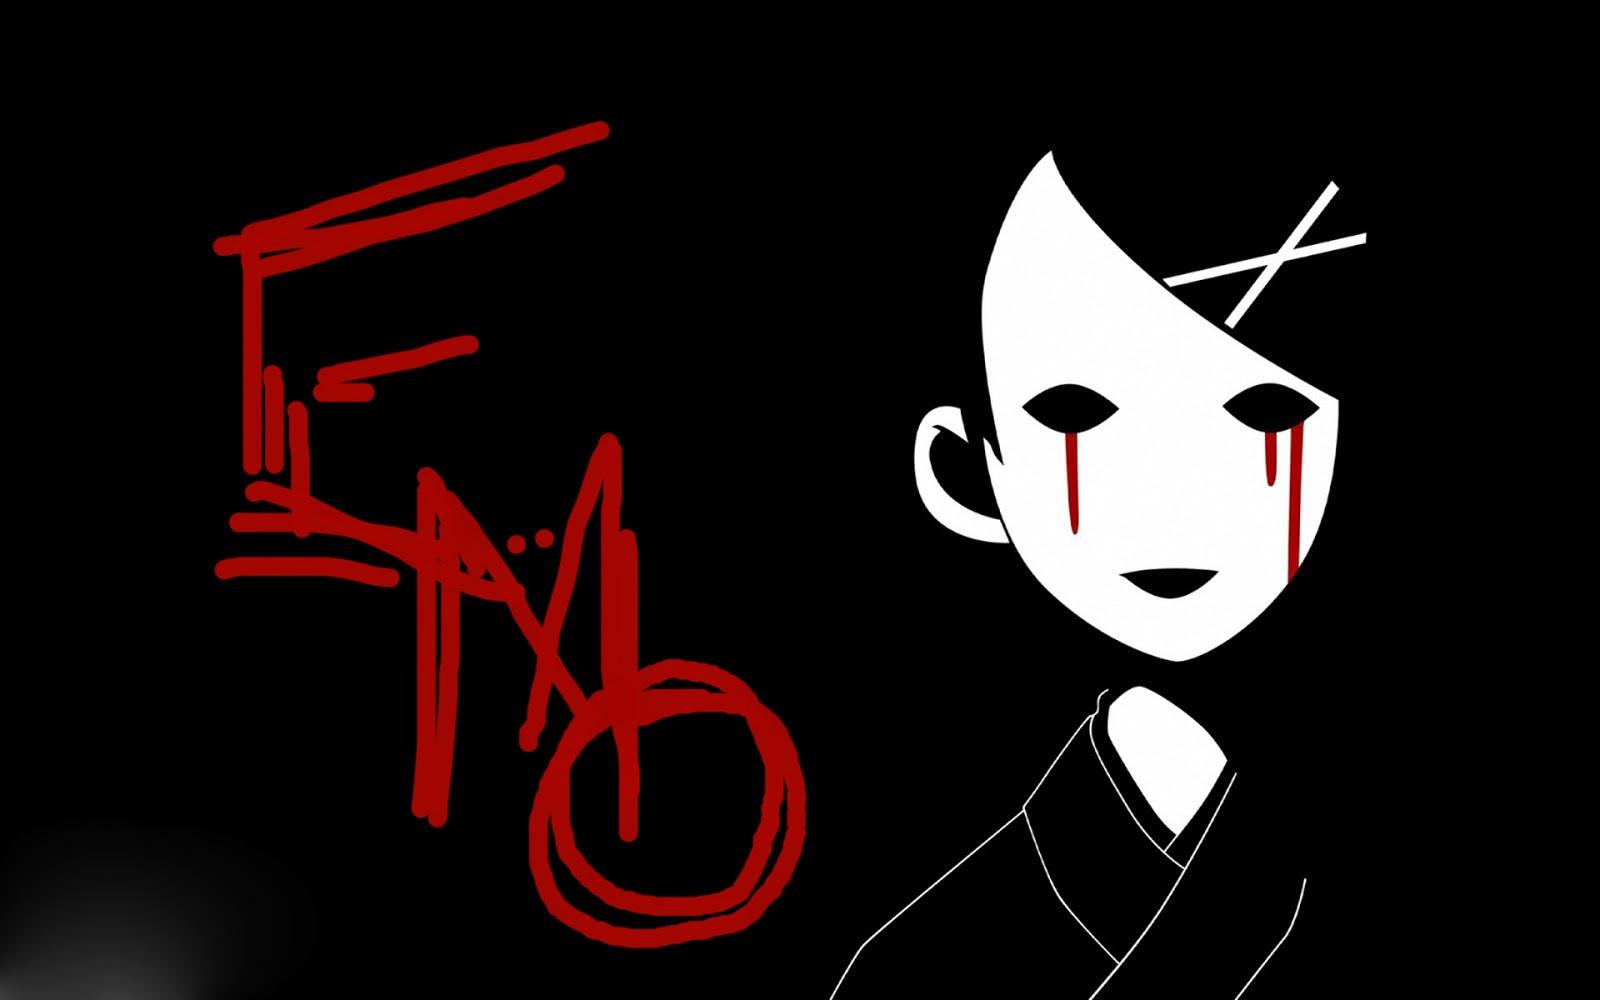 DREAM ZONE Anime Alone Sad Animated Emo Boys Wallpapers 1920 1200 1600x1000